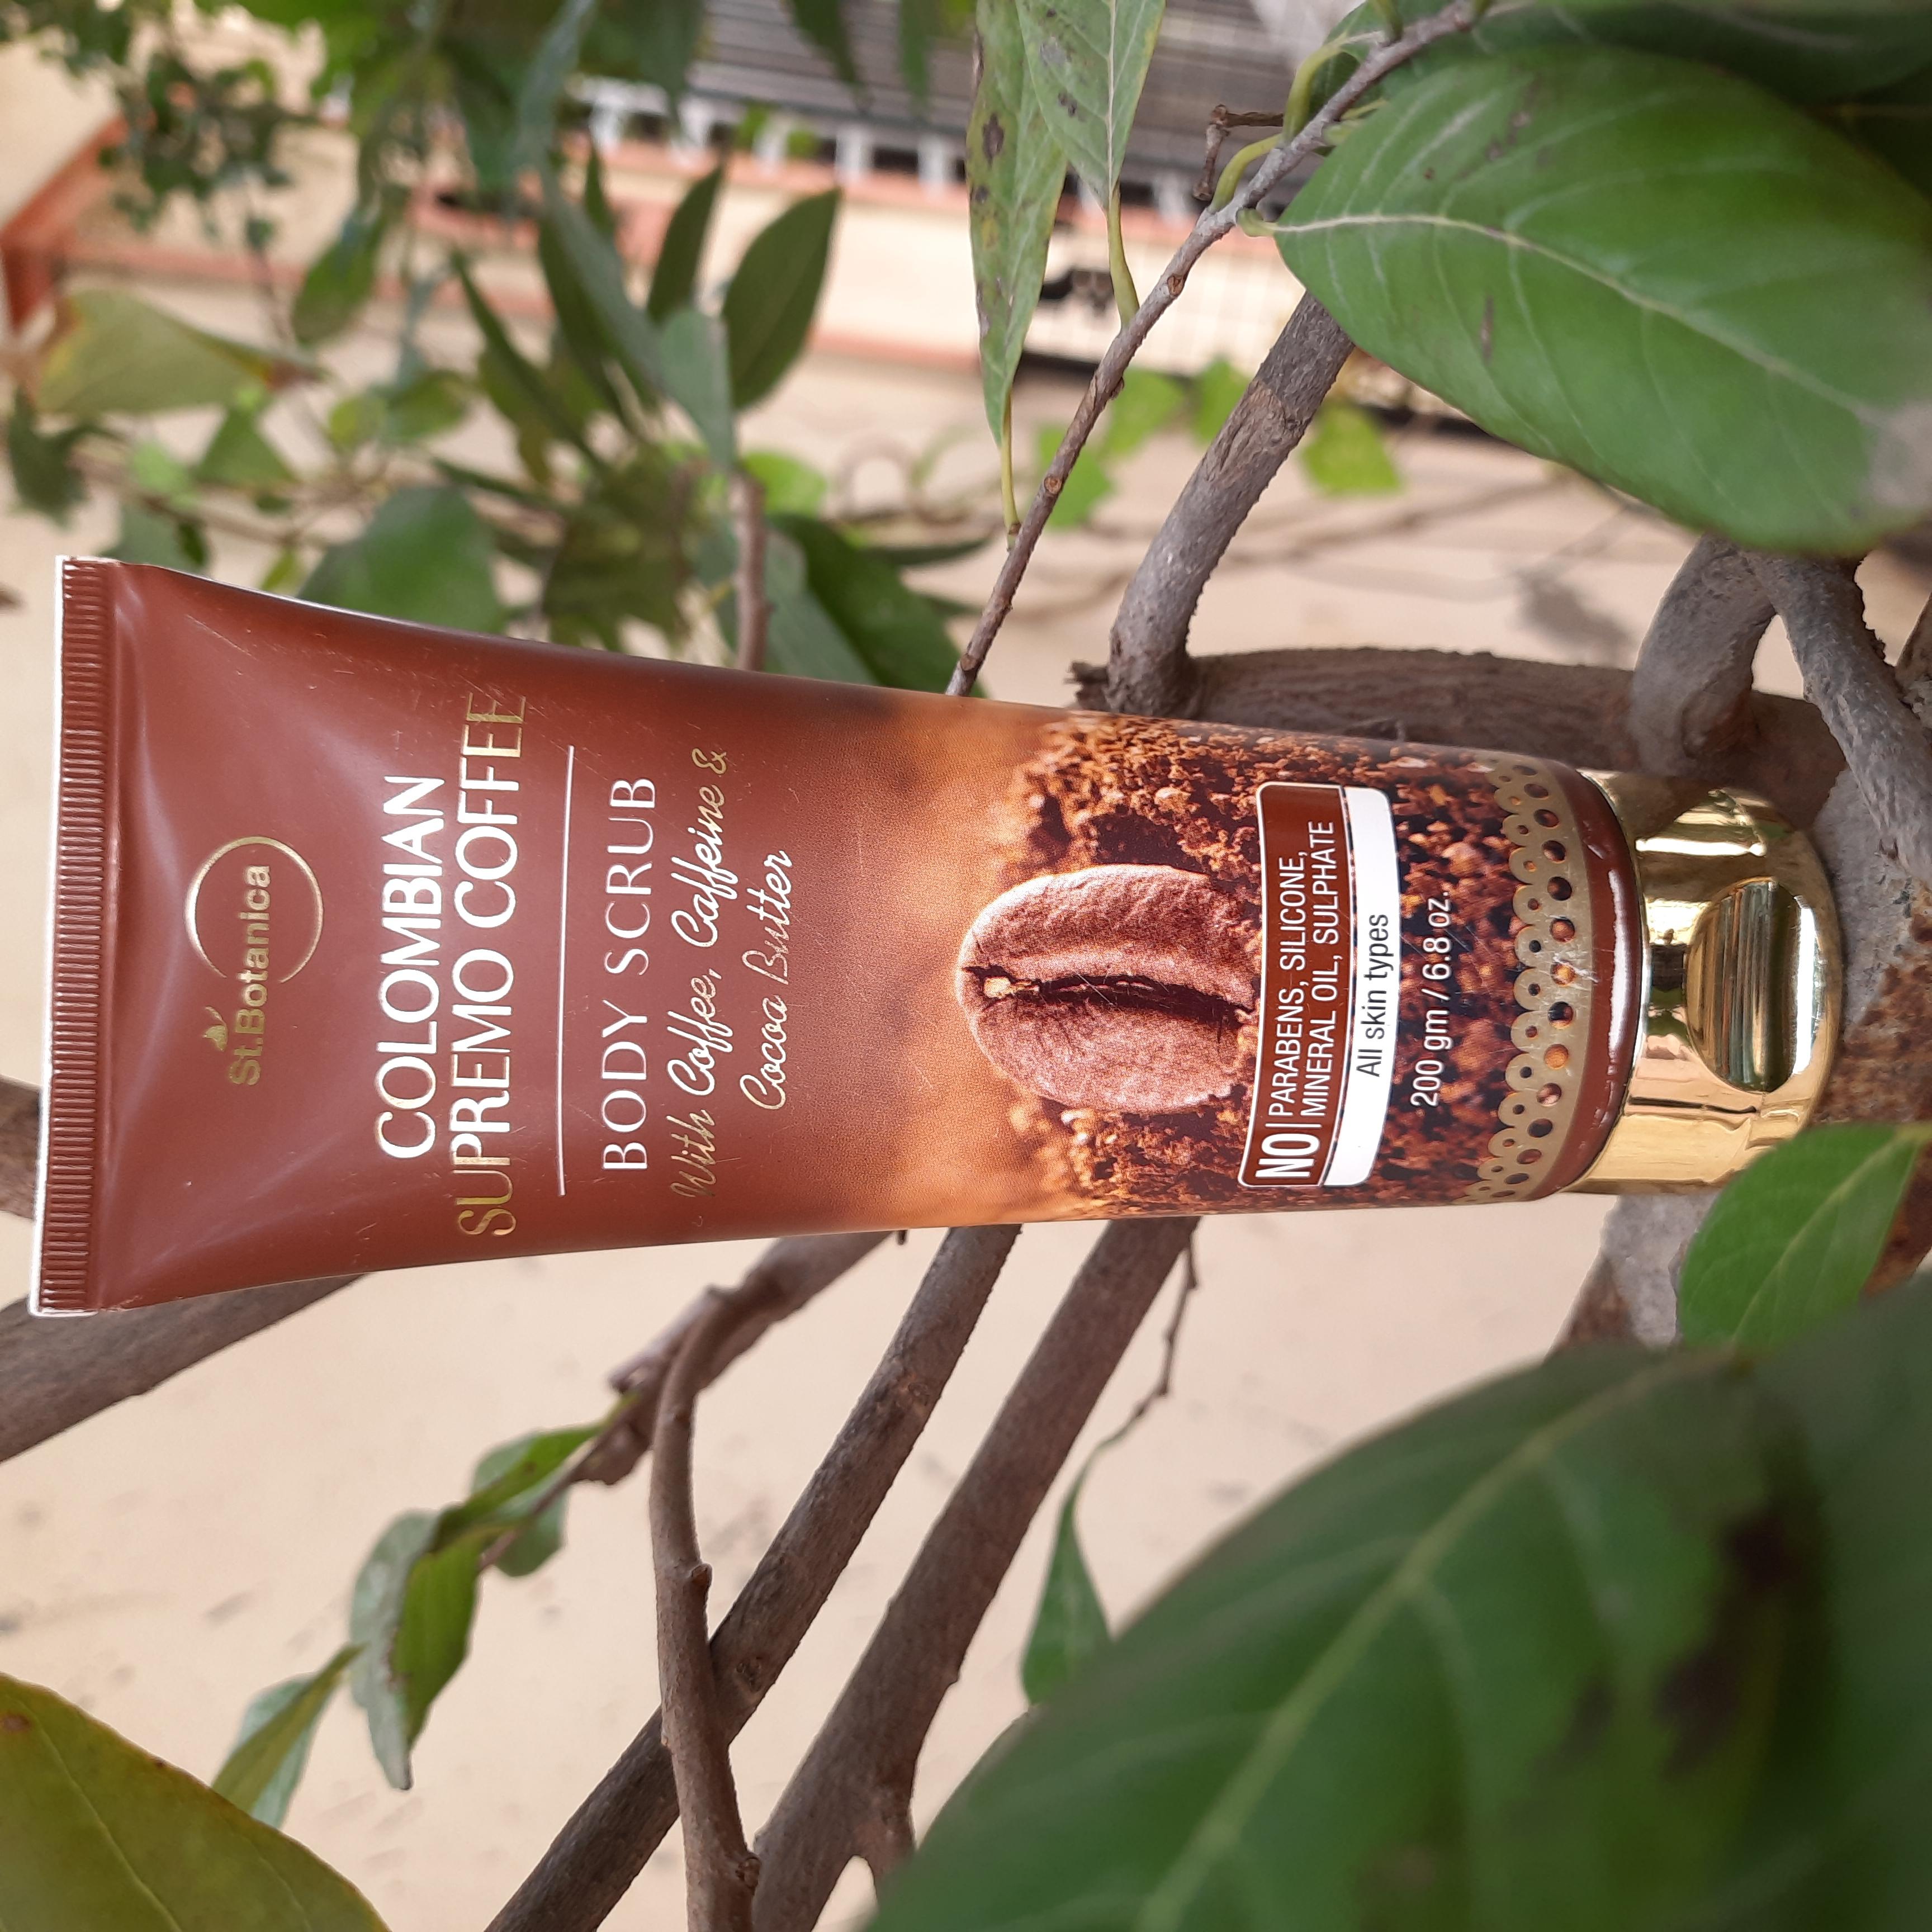 St.Botanica Arabica Coffee Face Scrub-Highly recommended-By supriyaprasad12